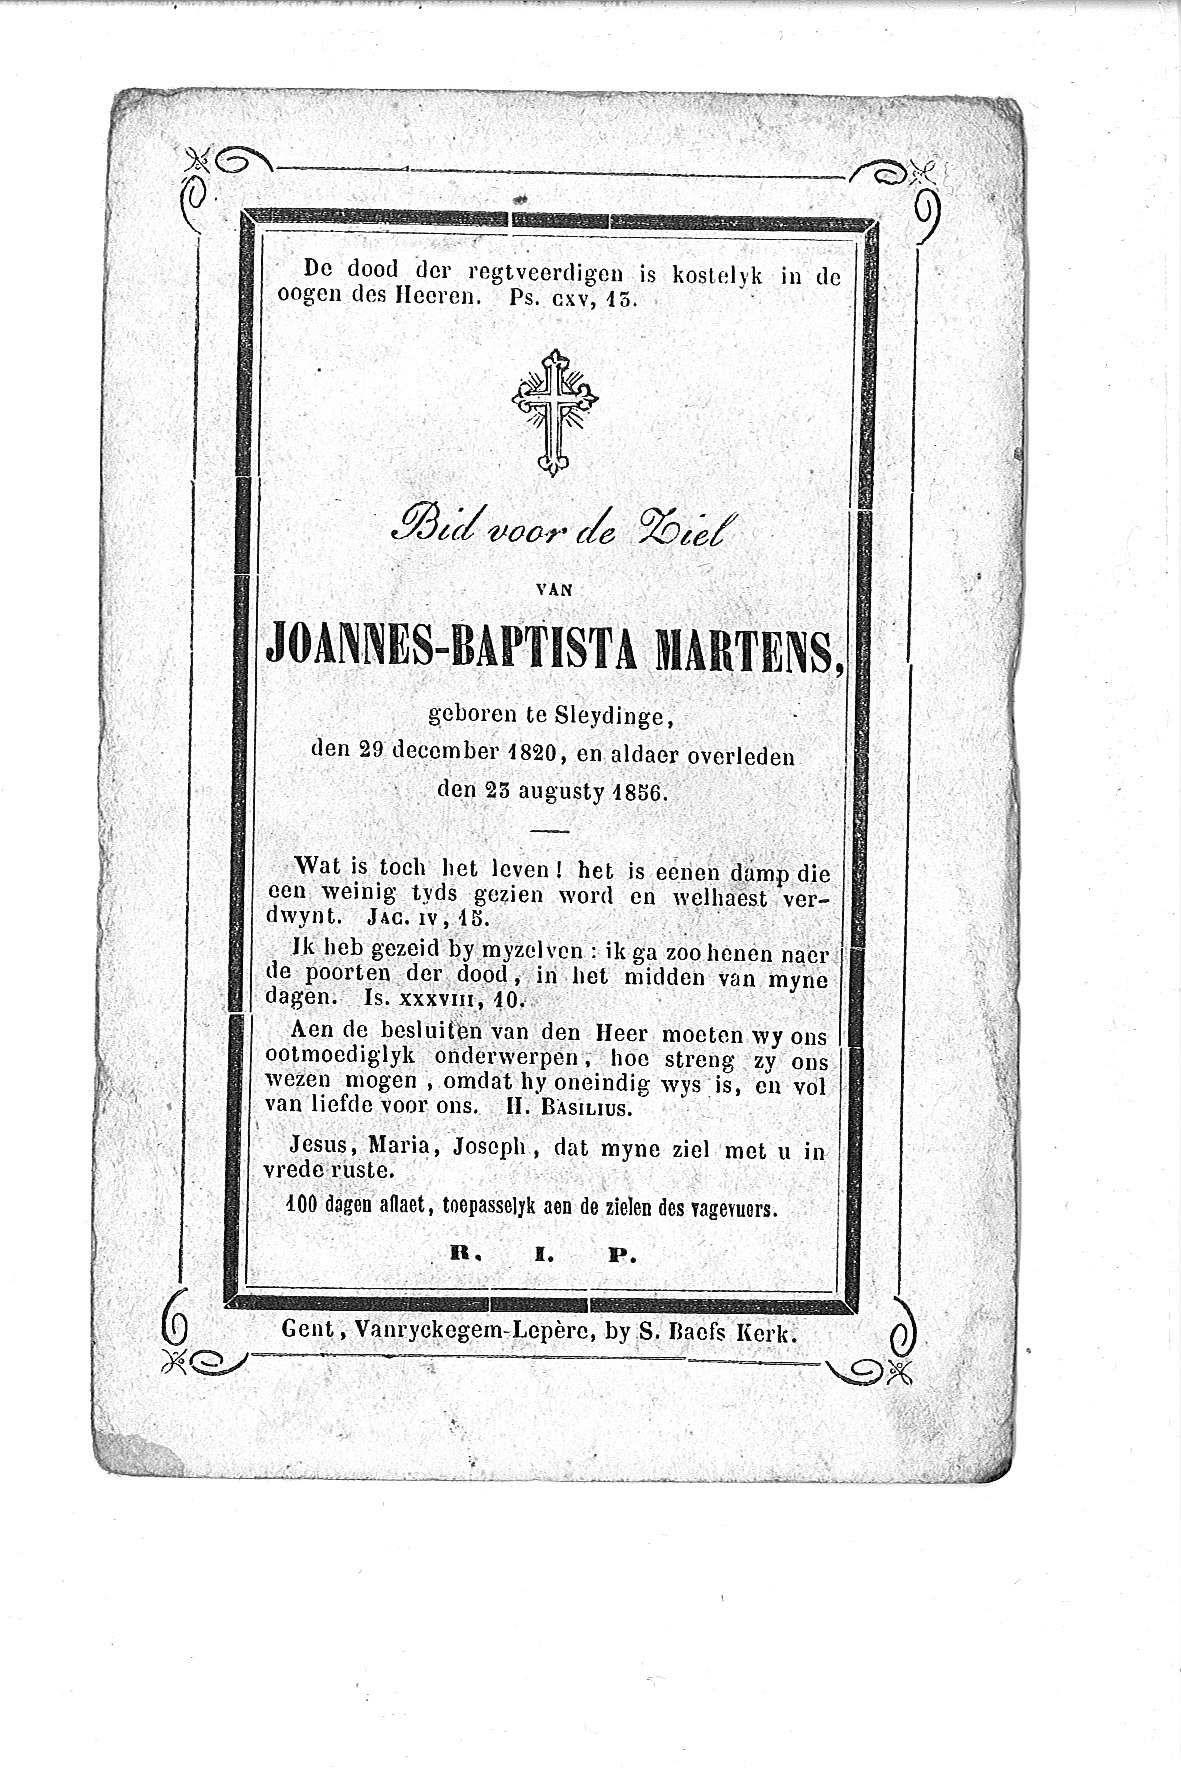 Joannes-Baptista(1856)20100128144930_00006.jpg